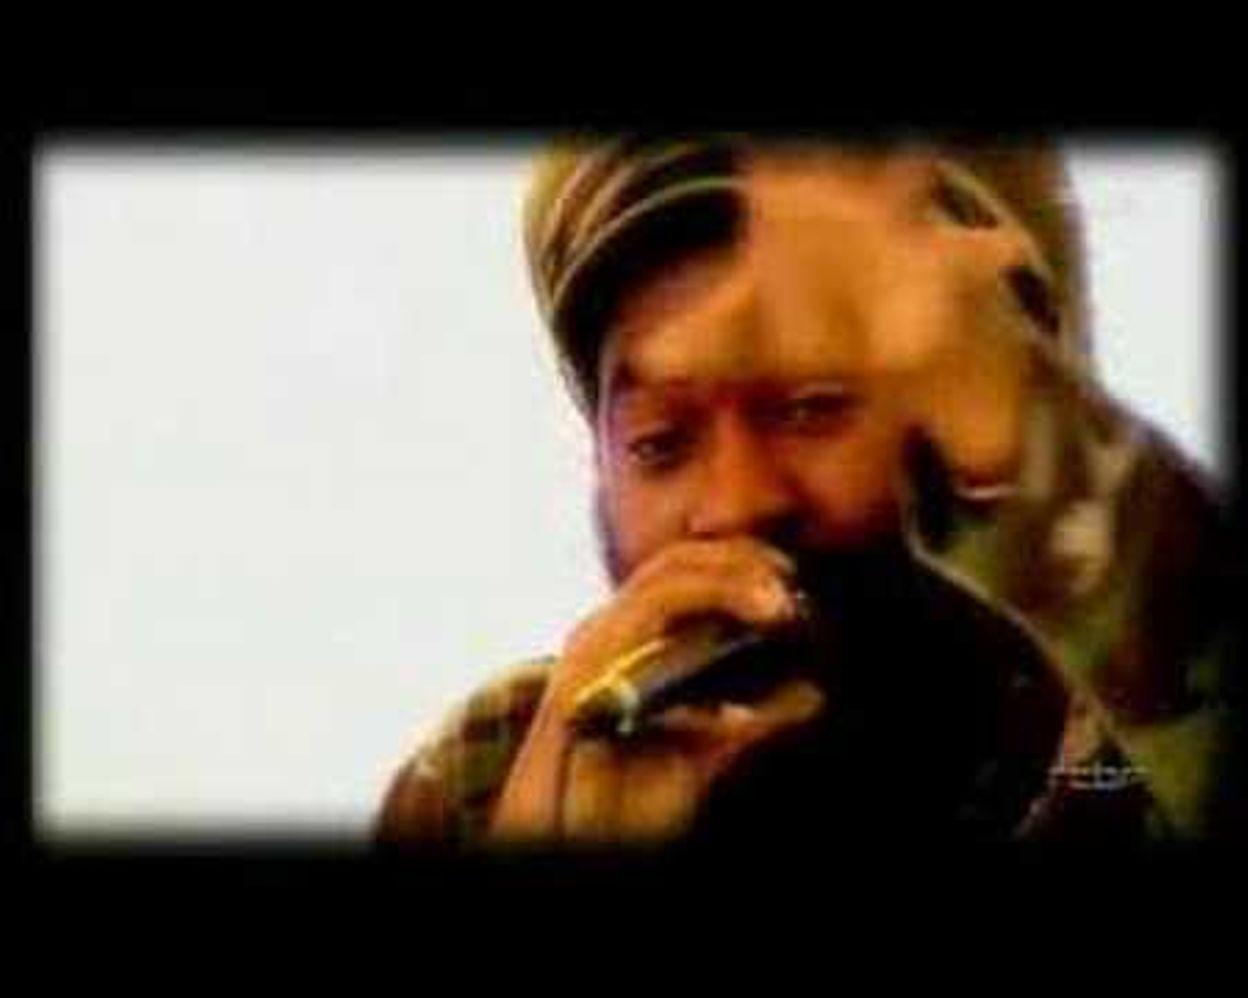 02.OMAR PERRY TV Show 50° Nord (Rasta Meditation)